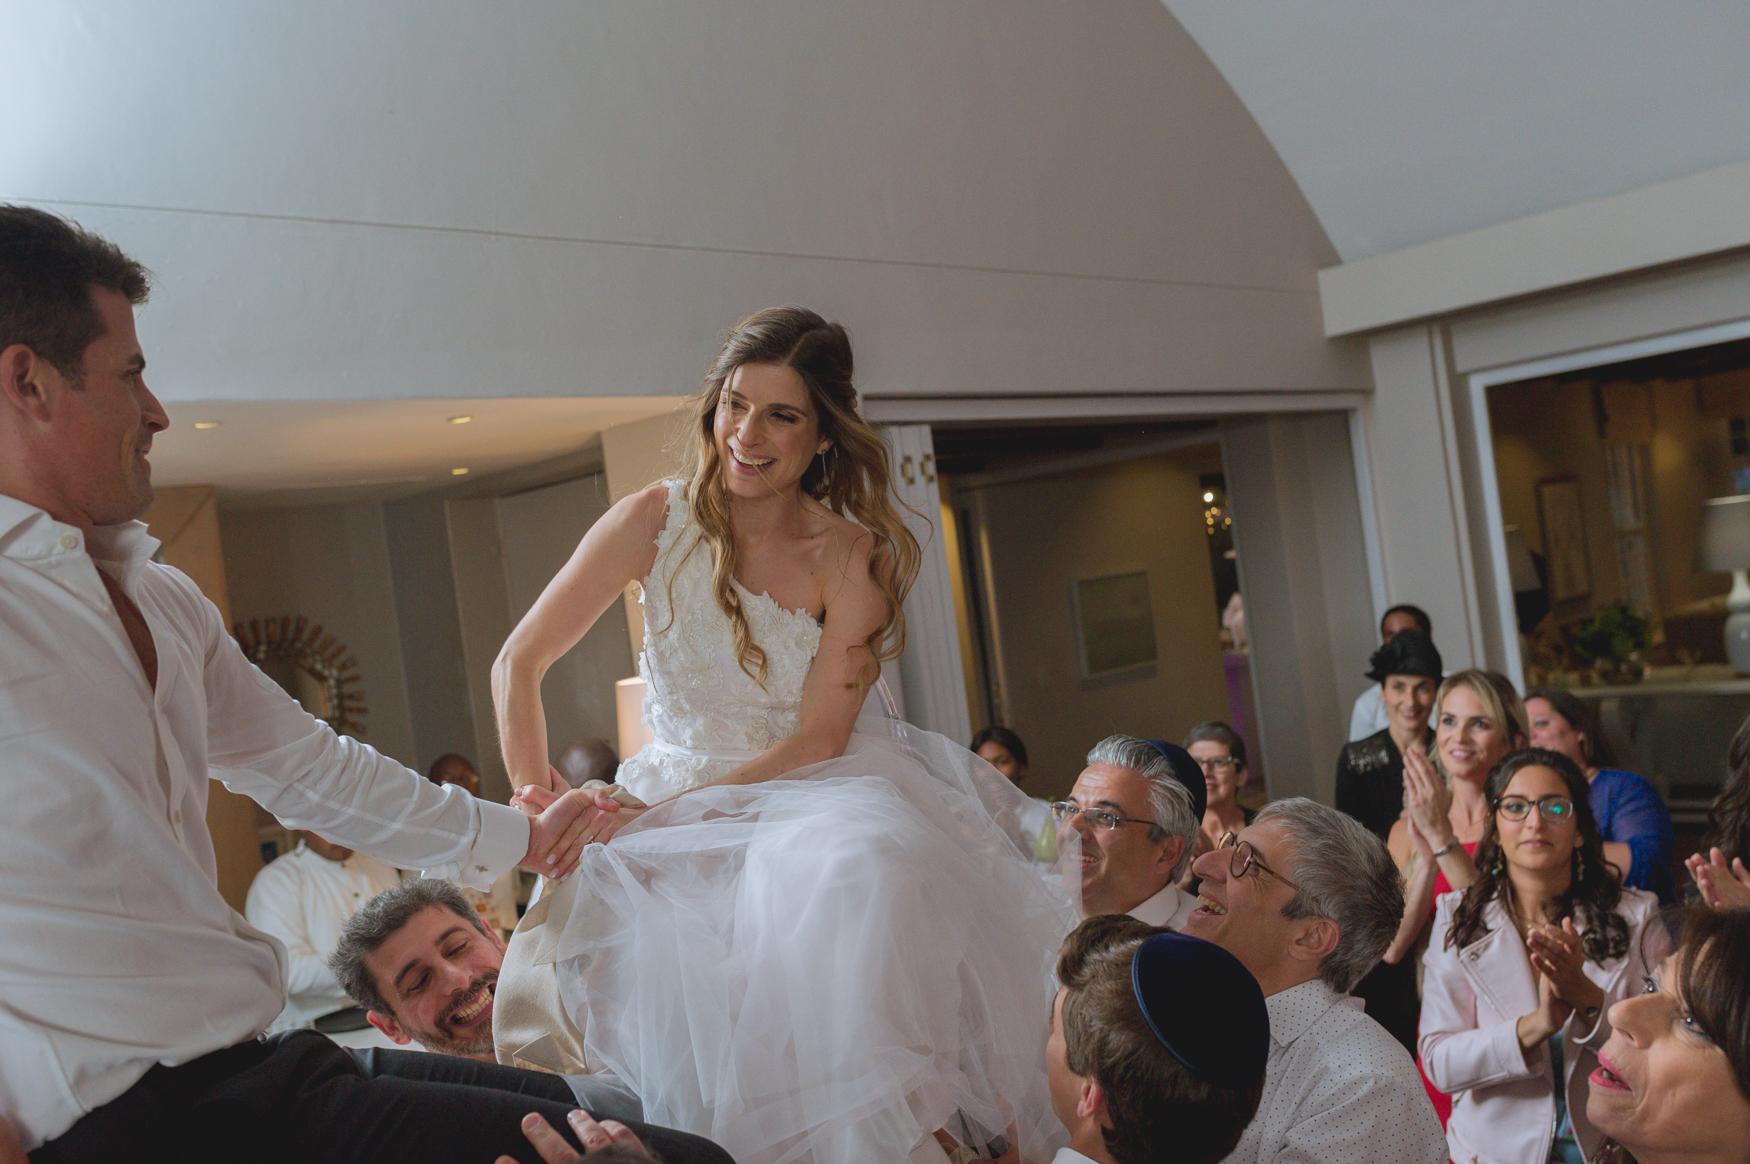 Leon_&_Martine's_Wedding_Photographs_17th_April_2019_@johnhenryweddingphoto_Low_Resolution_Web-478.JPG